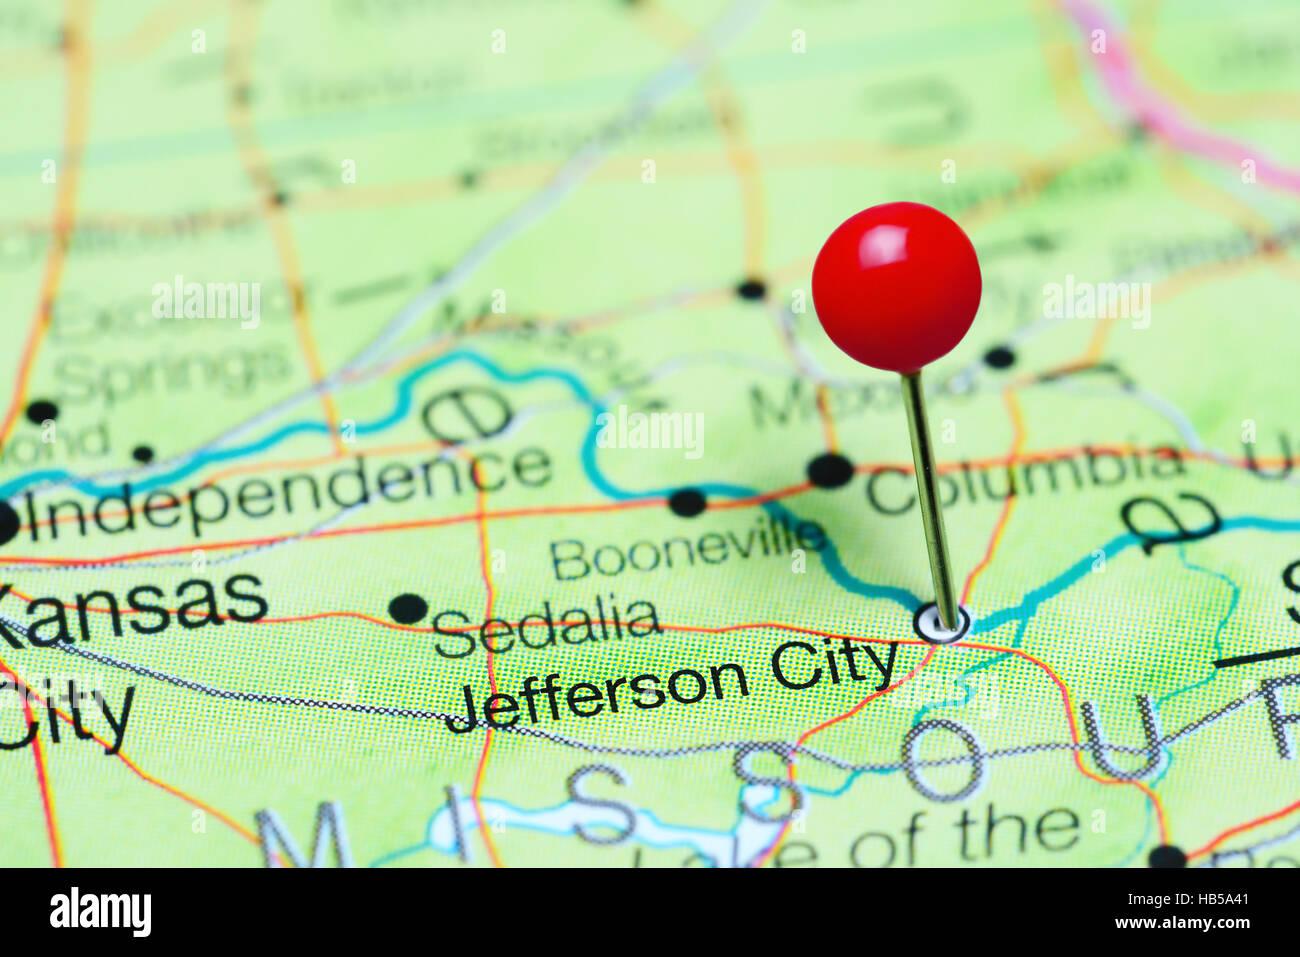 Jefferson City pinned on a map of Missouri USA Stock Photo Royalty